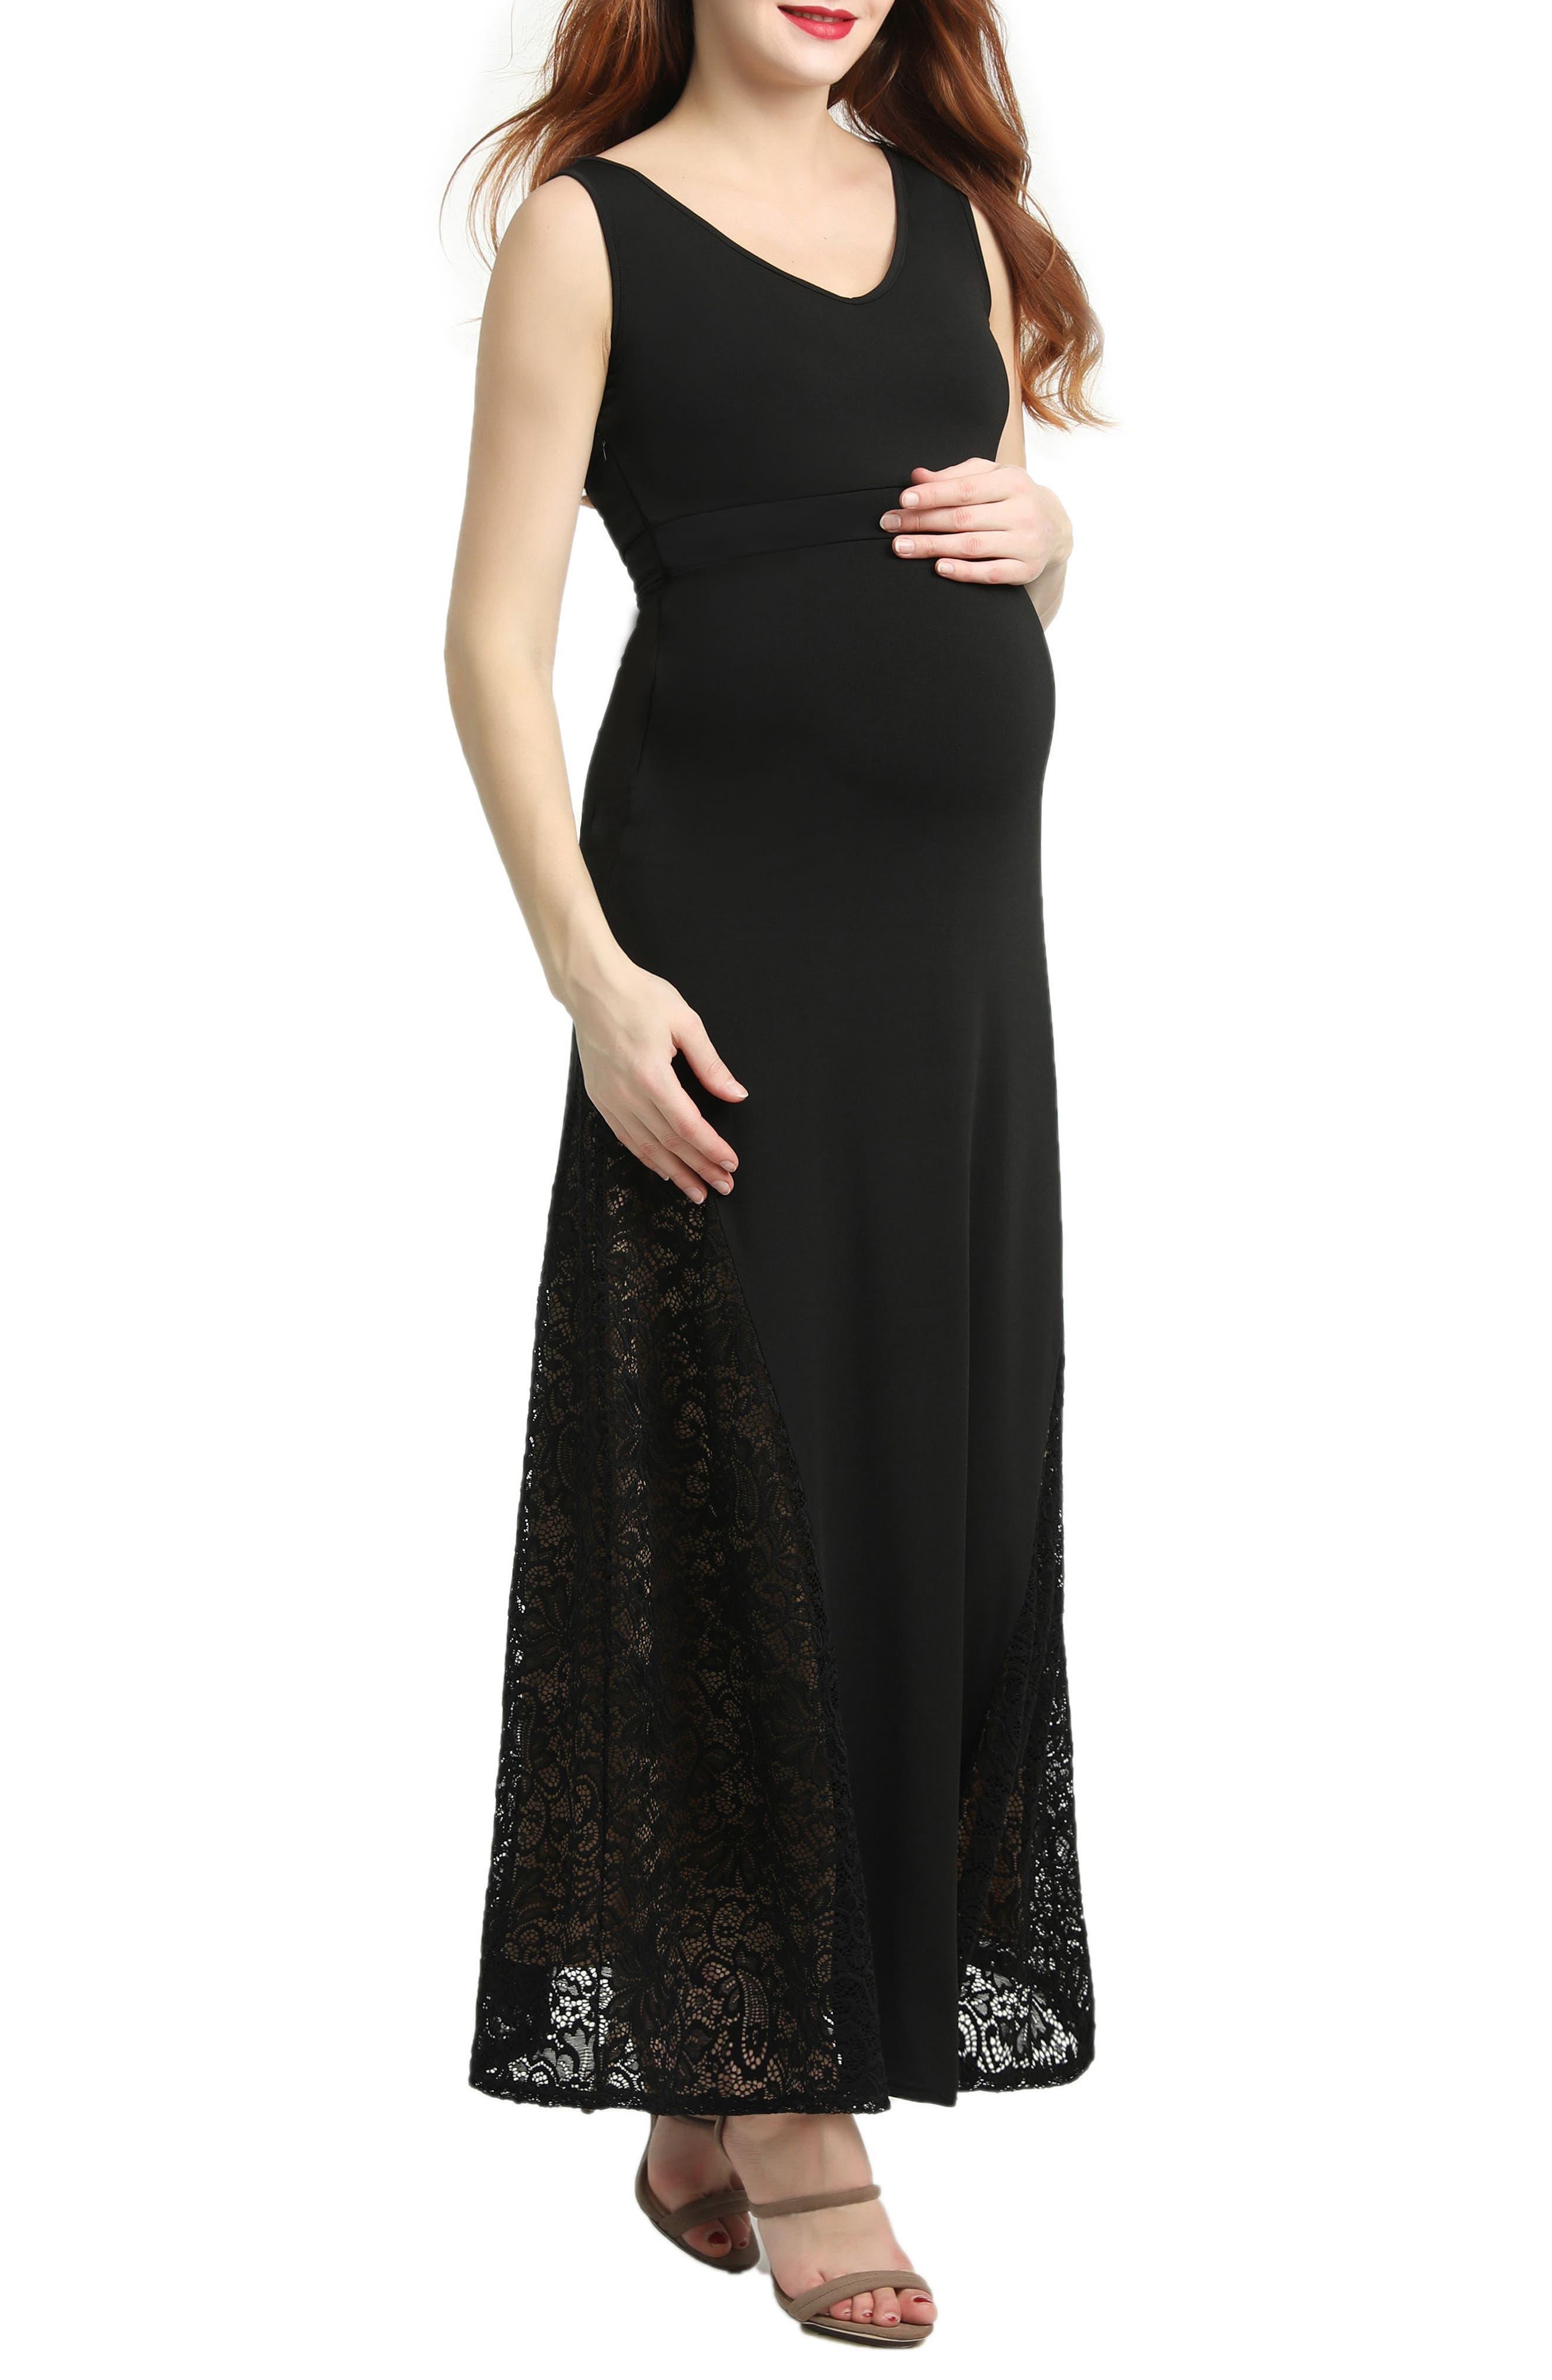 Elizabeth Lace Maternity Maxi Dress,                             Main thumbnail 1, color,                             Black